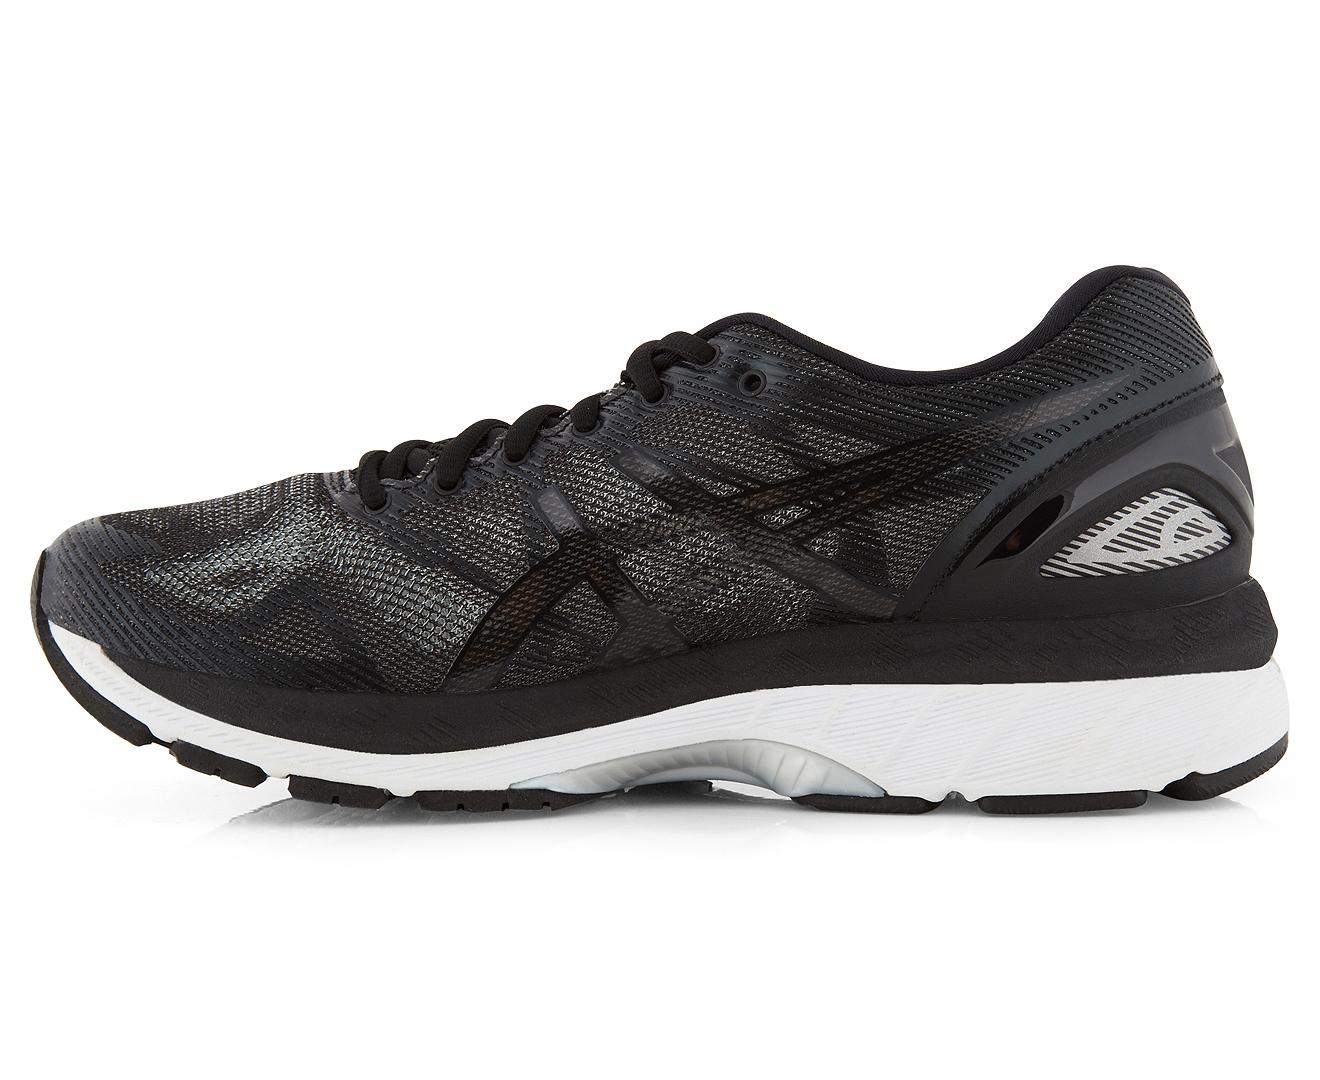 quality design 7b00e b2ea6 ASICS Women's GEL-Nimbus 19 Shoe - Black/Onyx/Silver